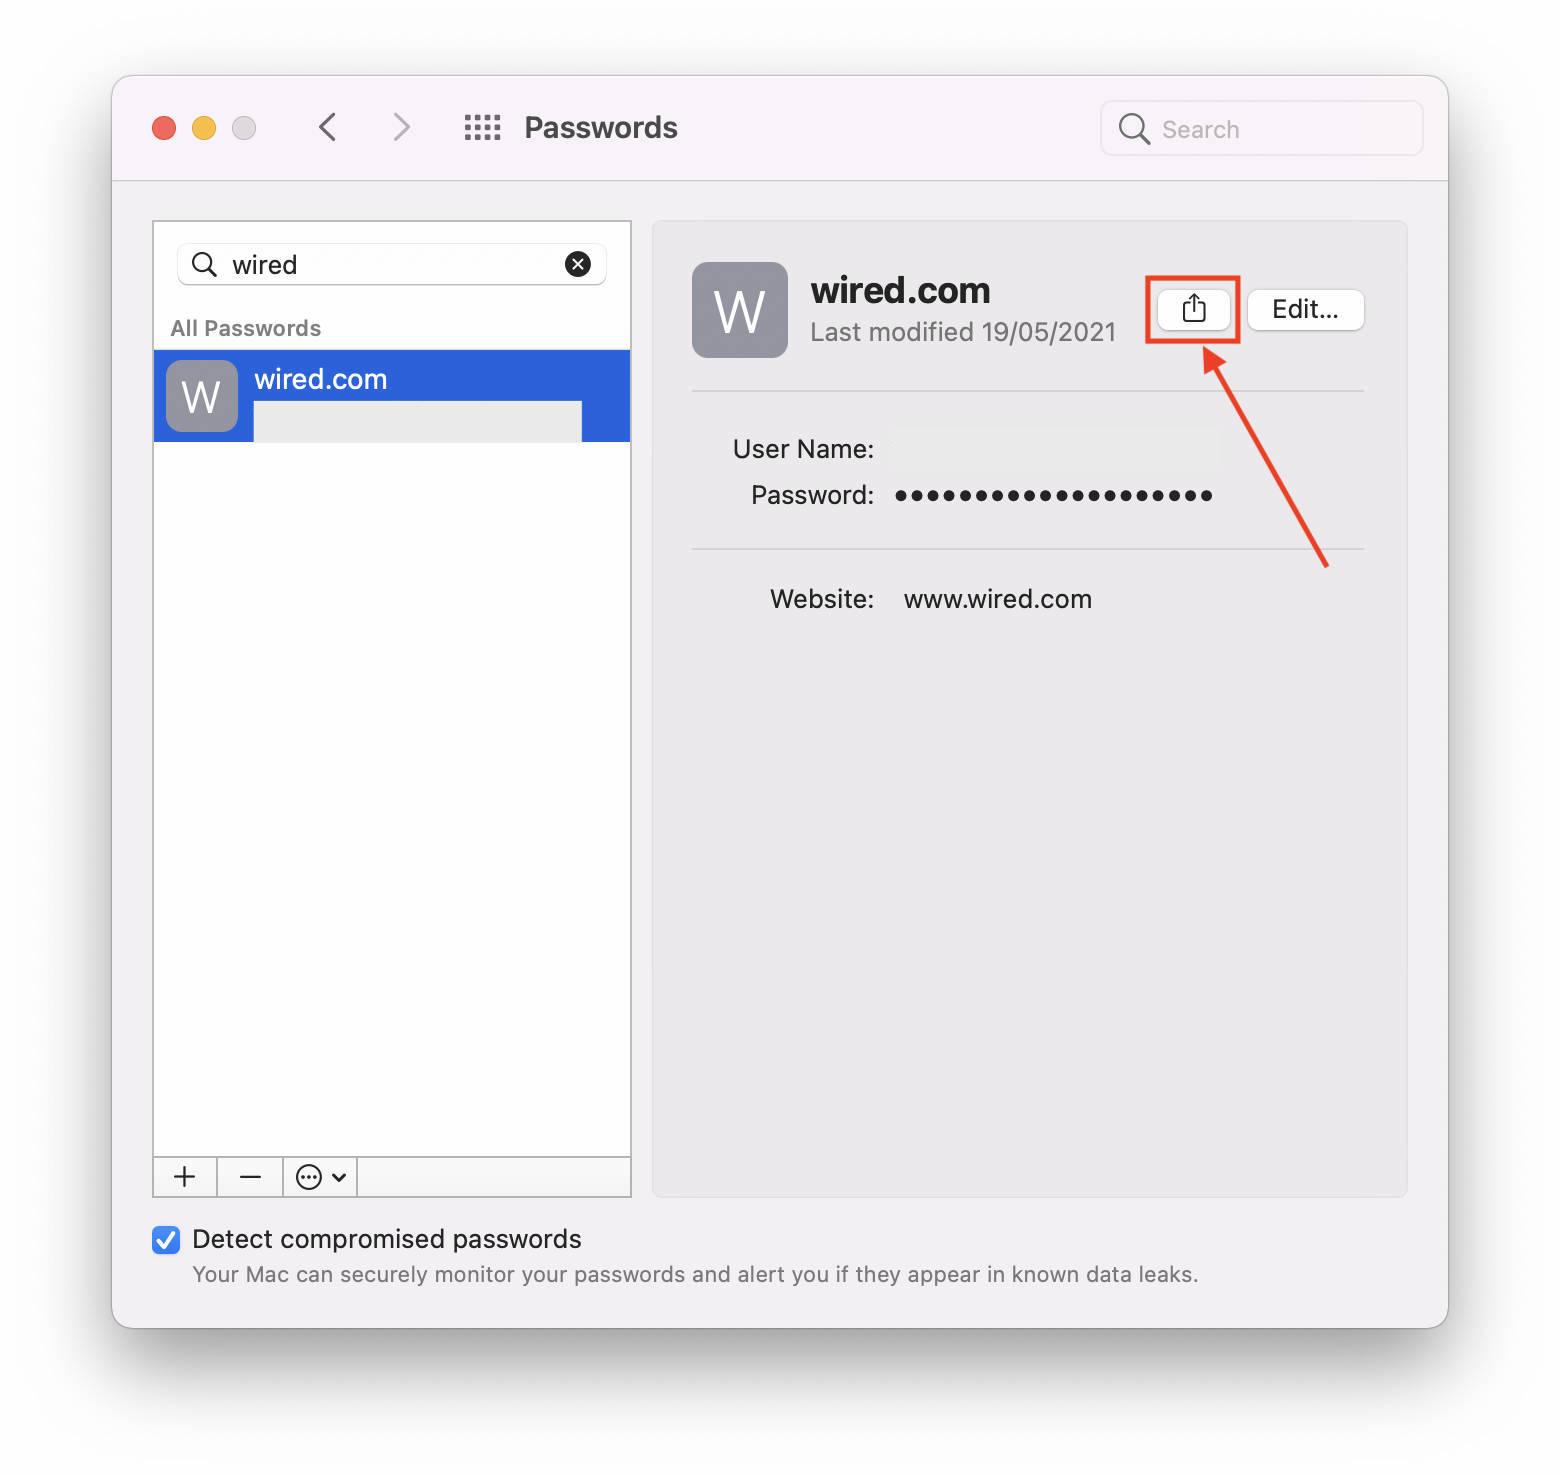 macOS 12 Monterey Passwords sharing button.